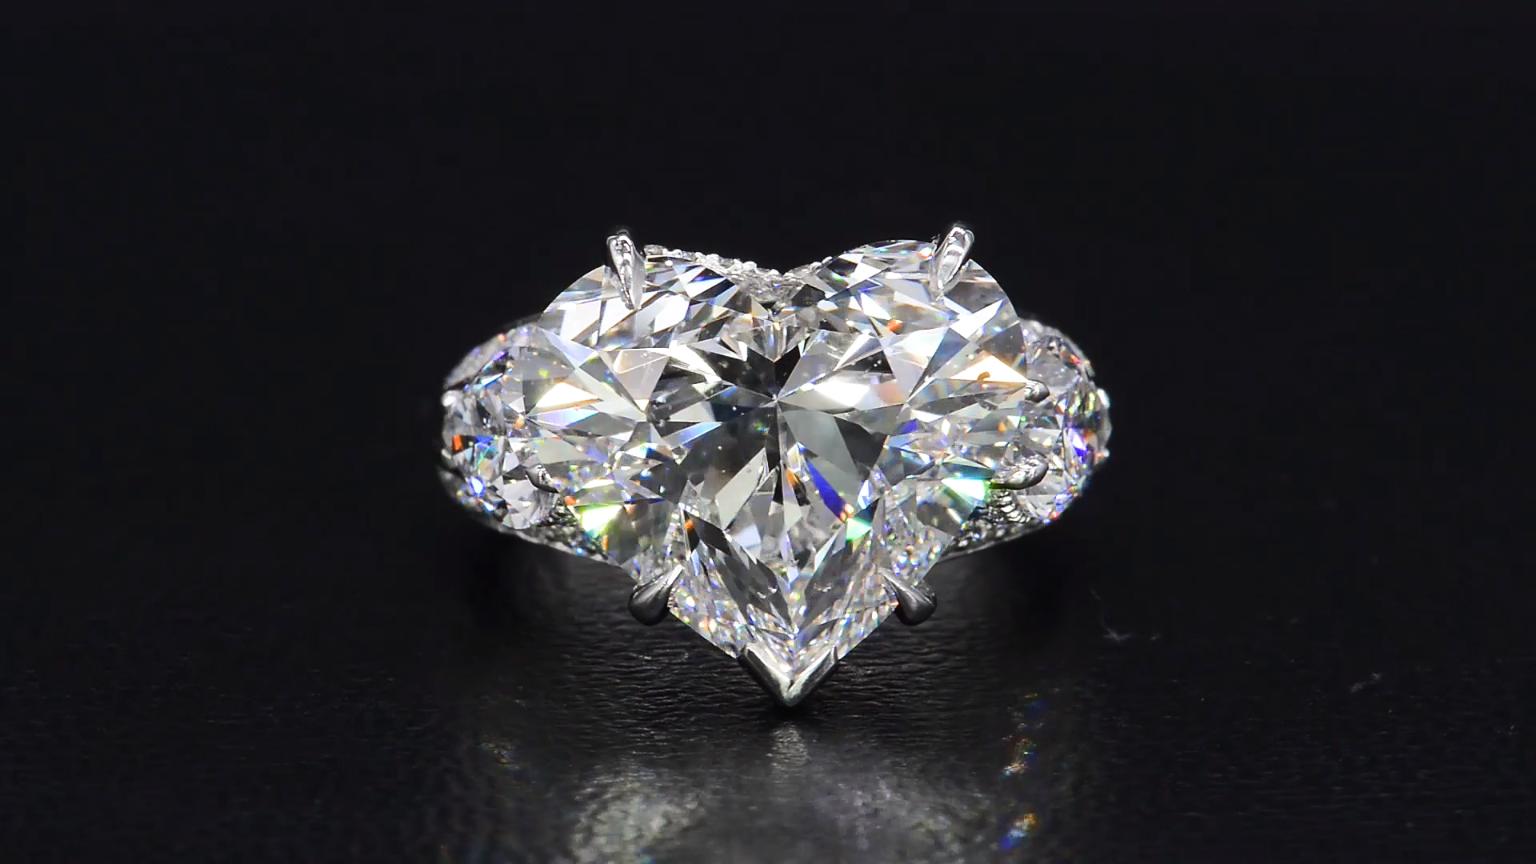 An Enamoring 10 Carat Heart Shape Diamond Engagement Ring From Bez Ambar Fe Video Heart Shaped Diamond Engagement Ring Heart Shaped Diamond Diamond Engagement Rings